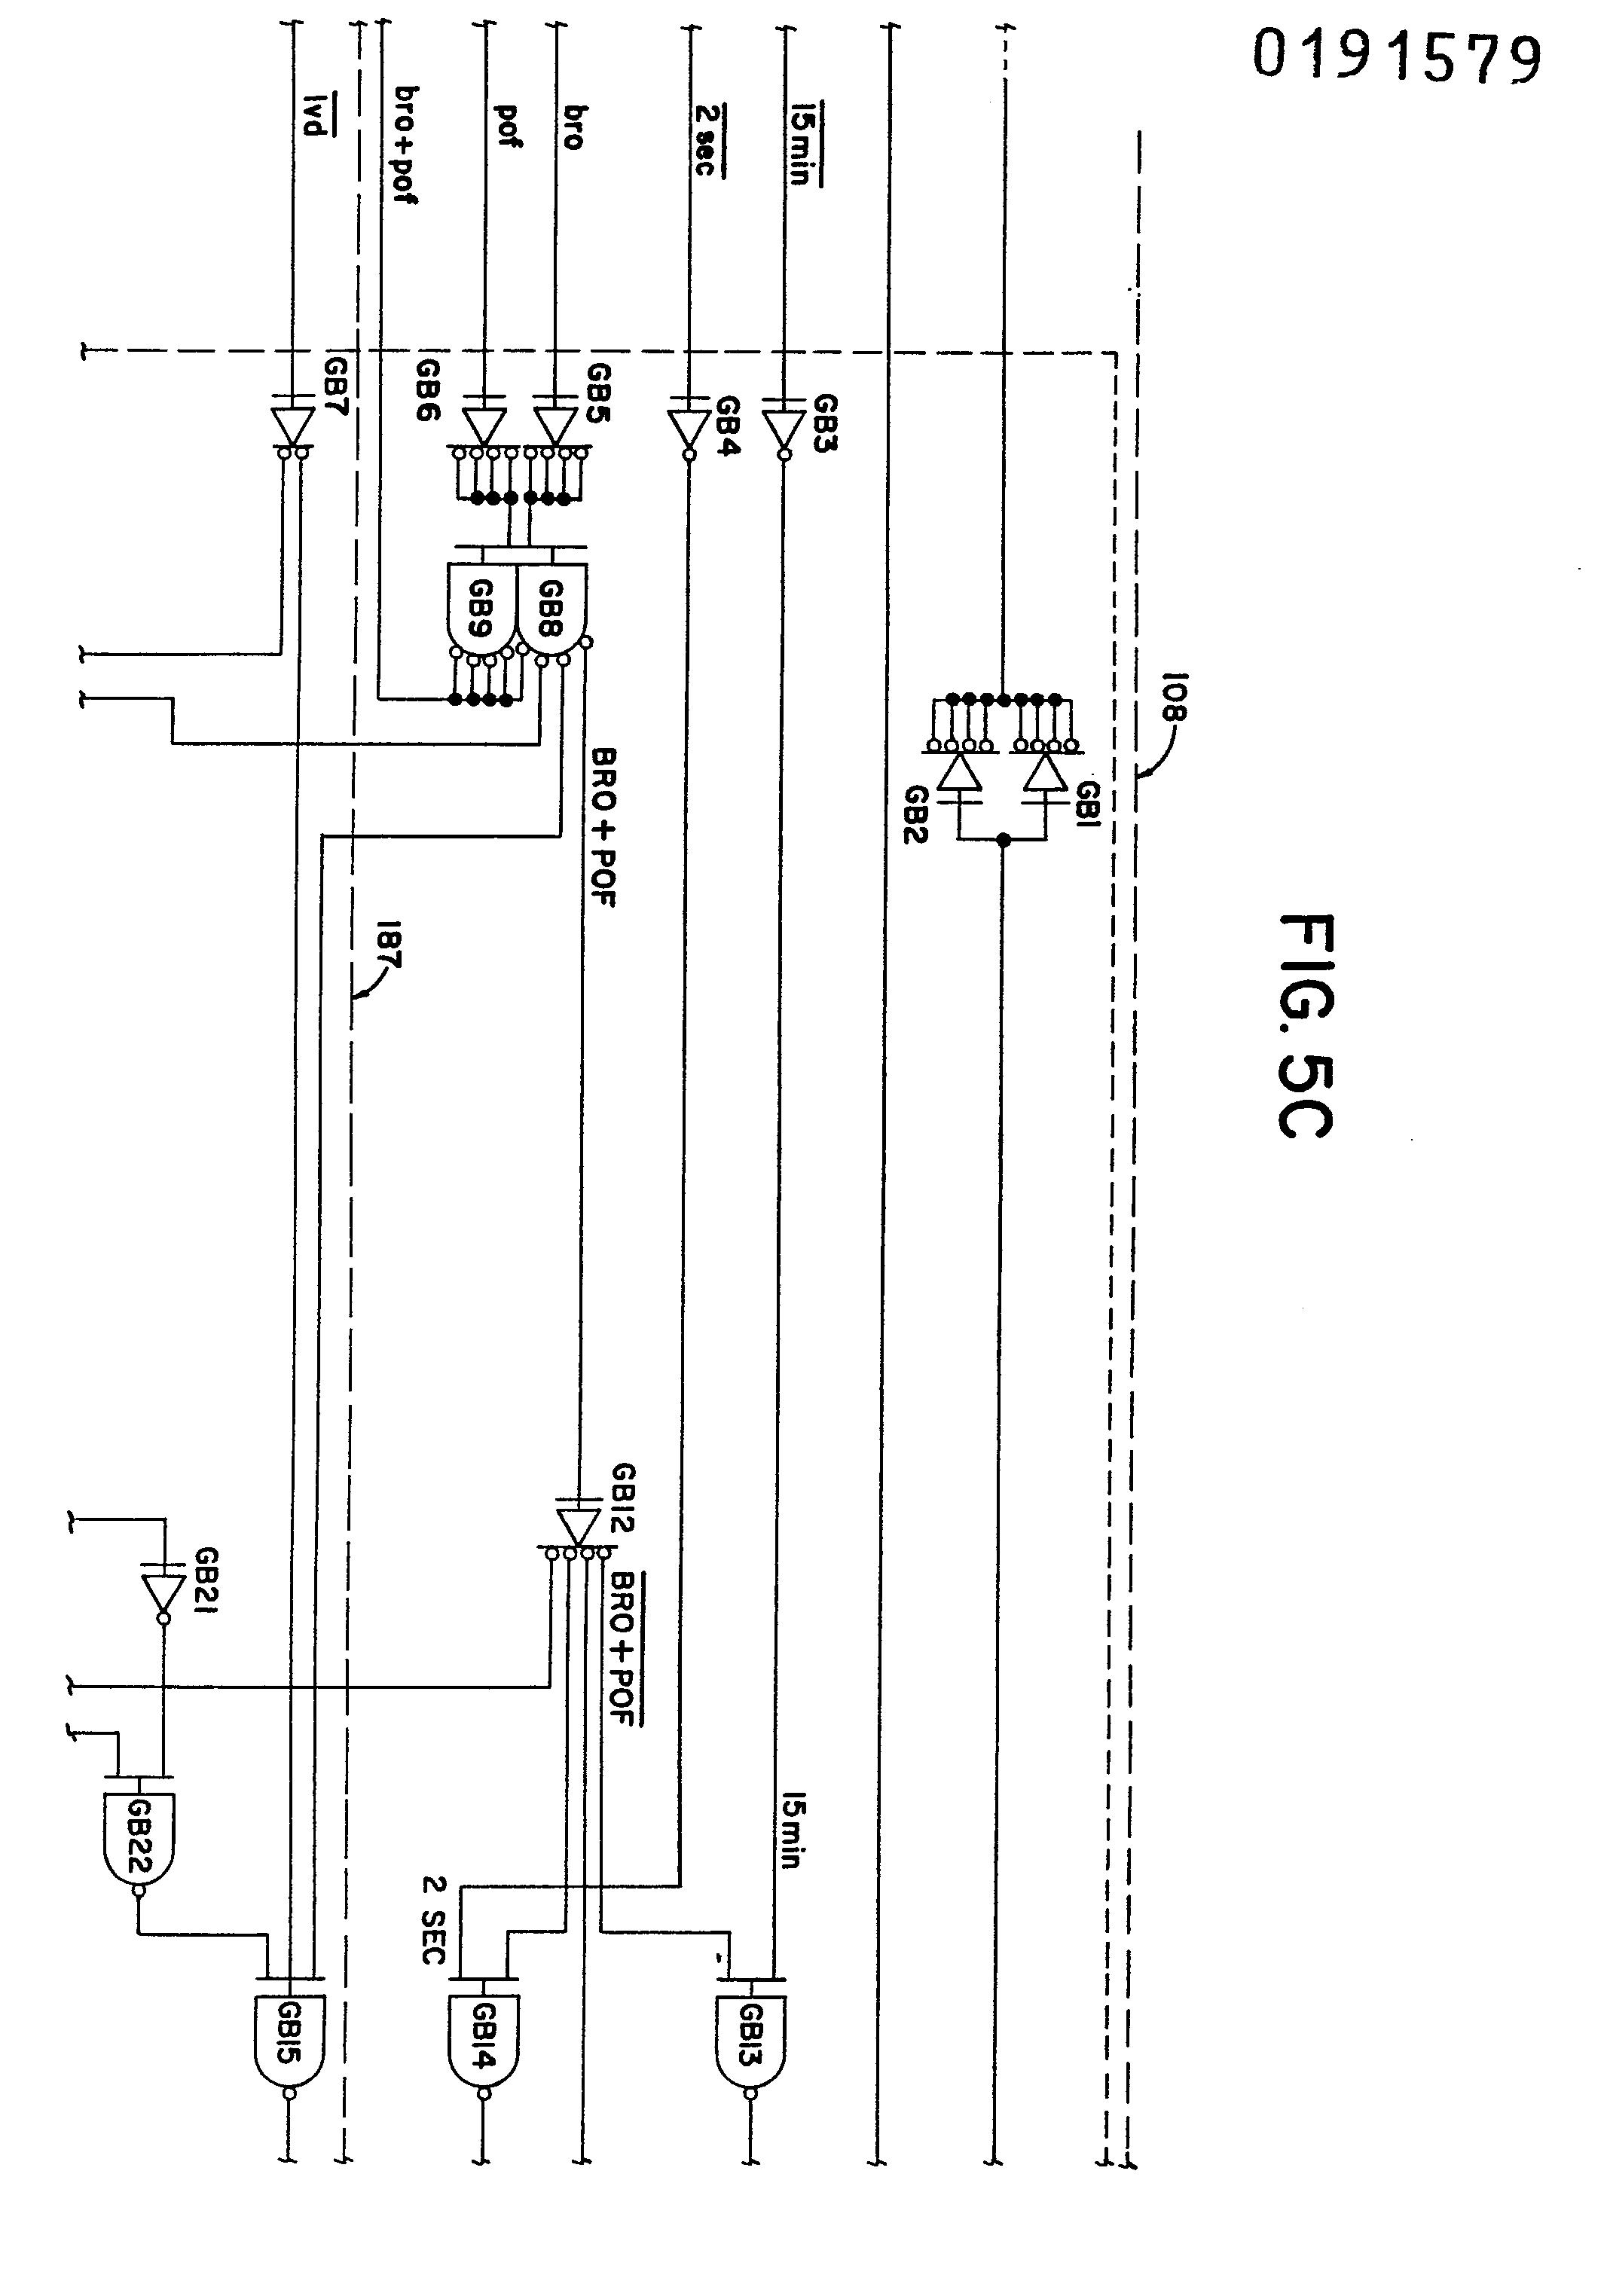 Emergi Lite Wiring Diagram Database International 9400i Fuse Emergency Lights Troubleshooting Lighting Systems 50 92 Diagrams Schemes